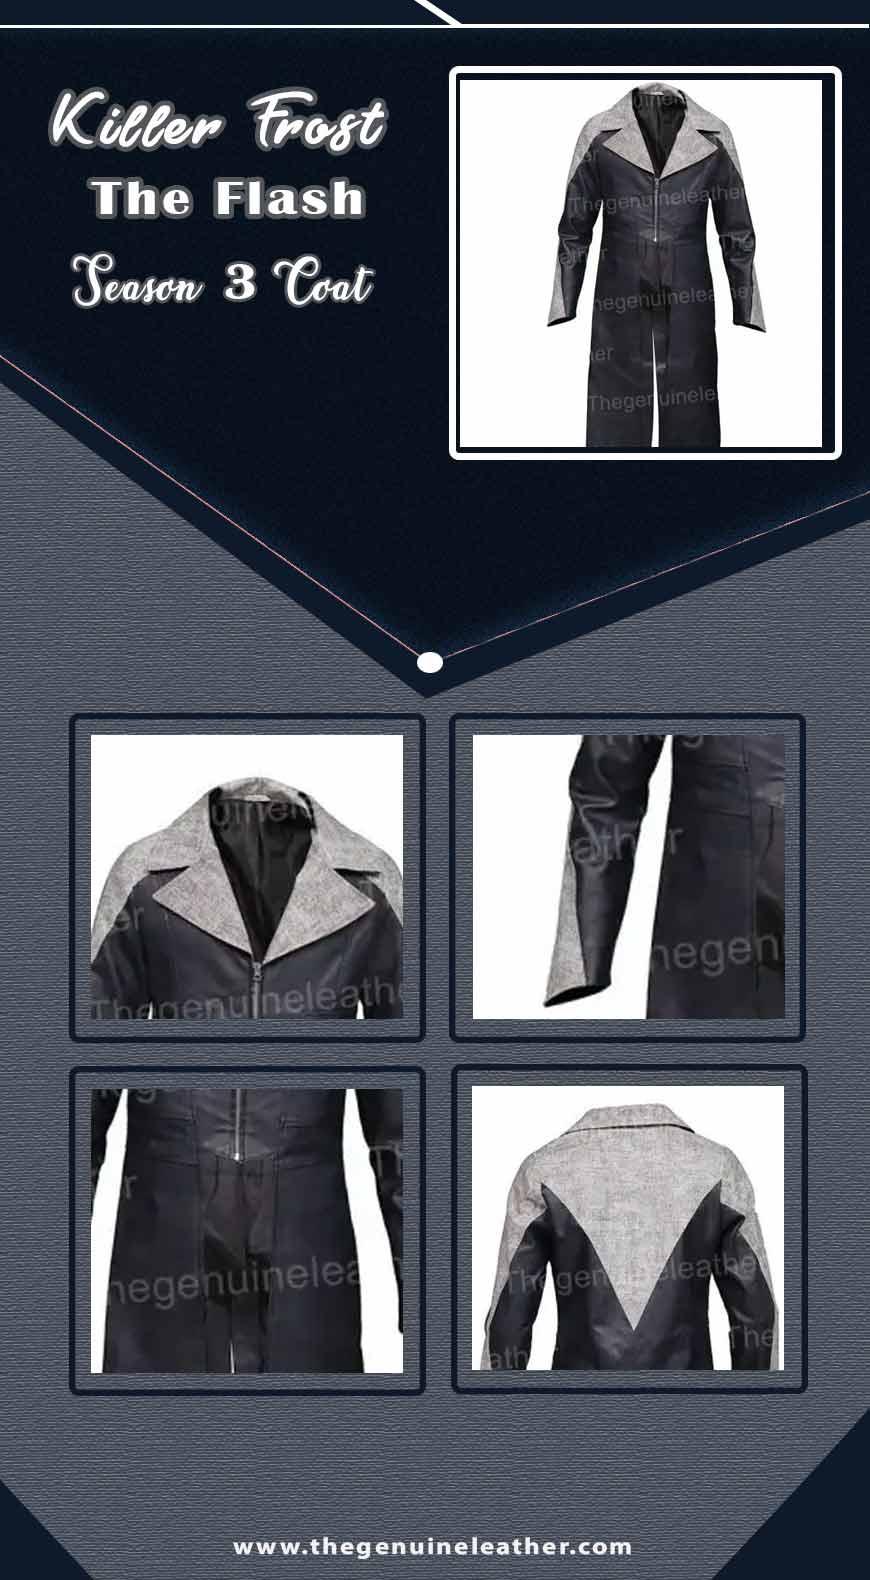 Killer Frost The Flash Season 3 Coat info